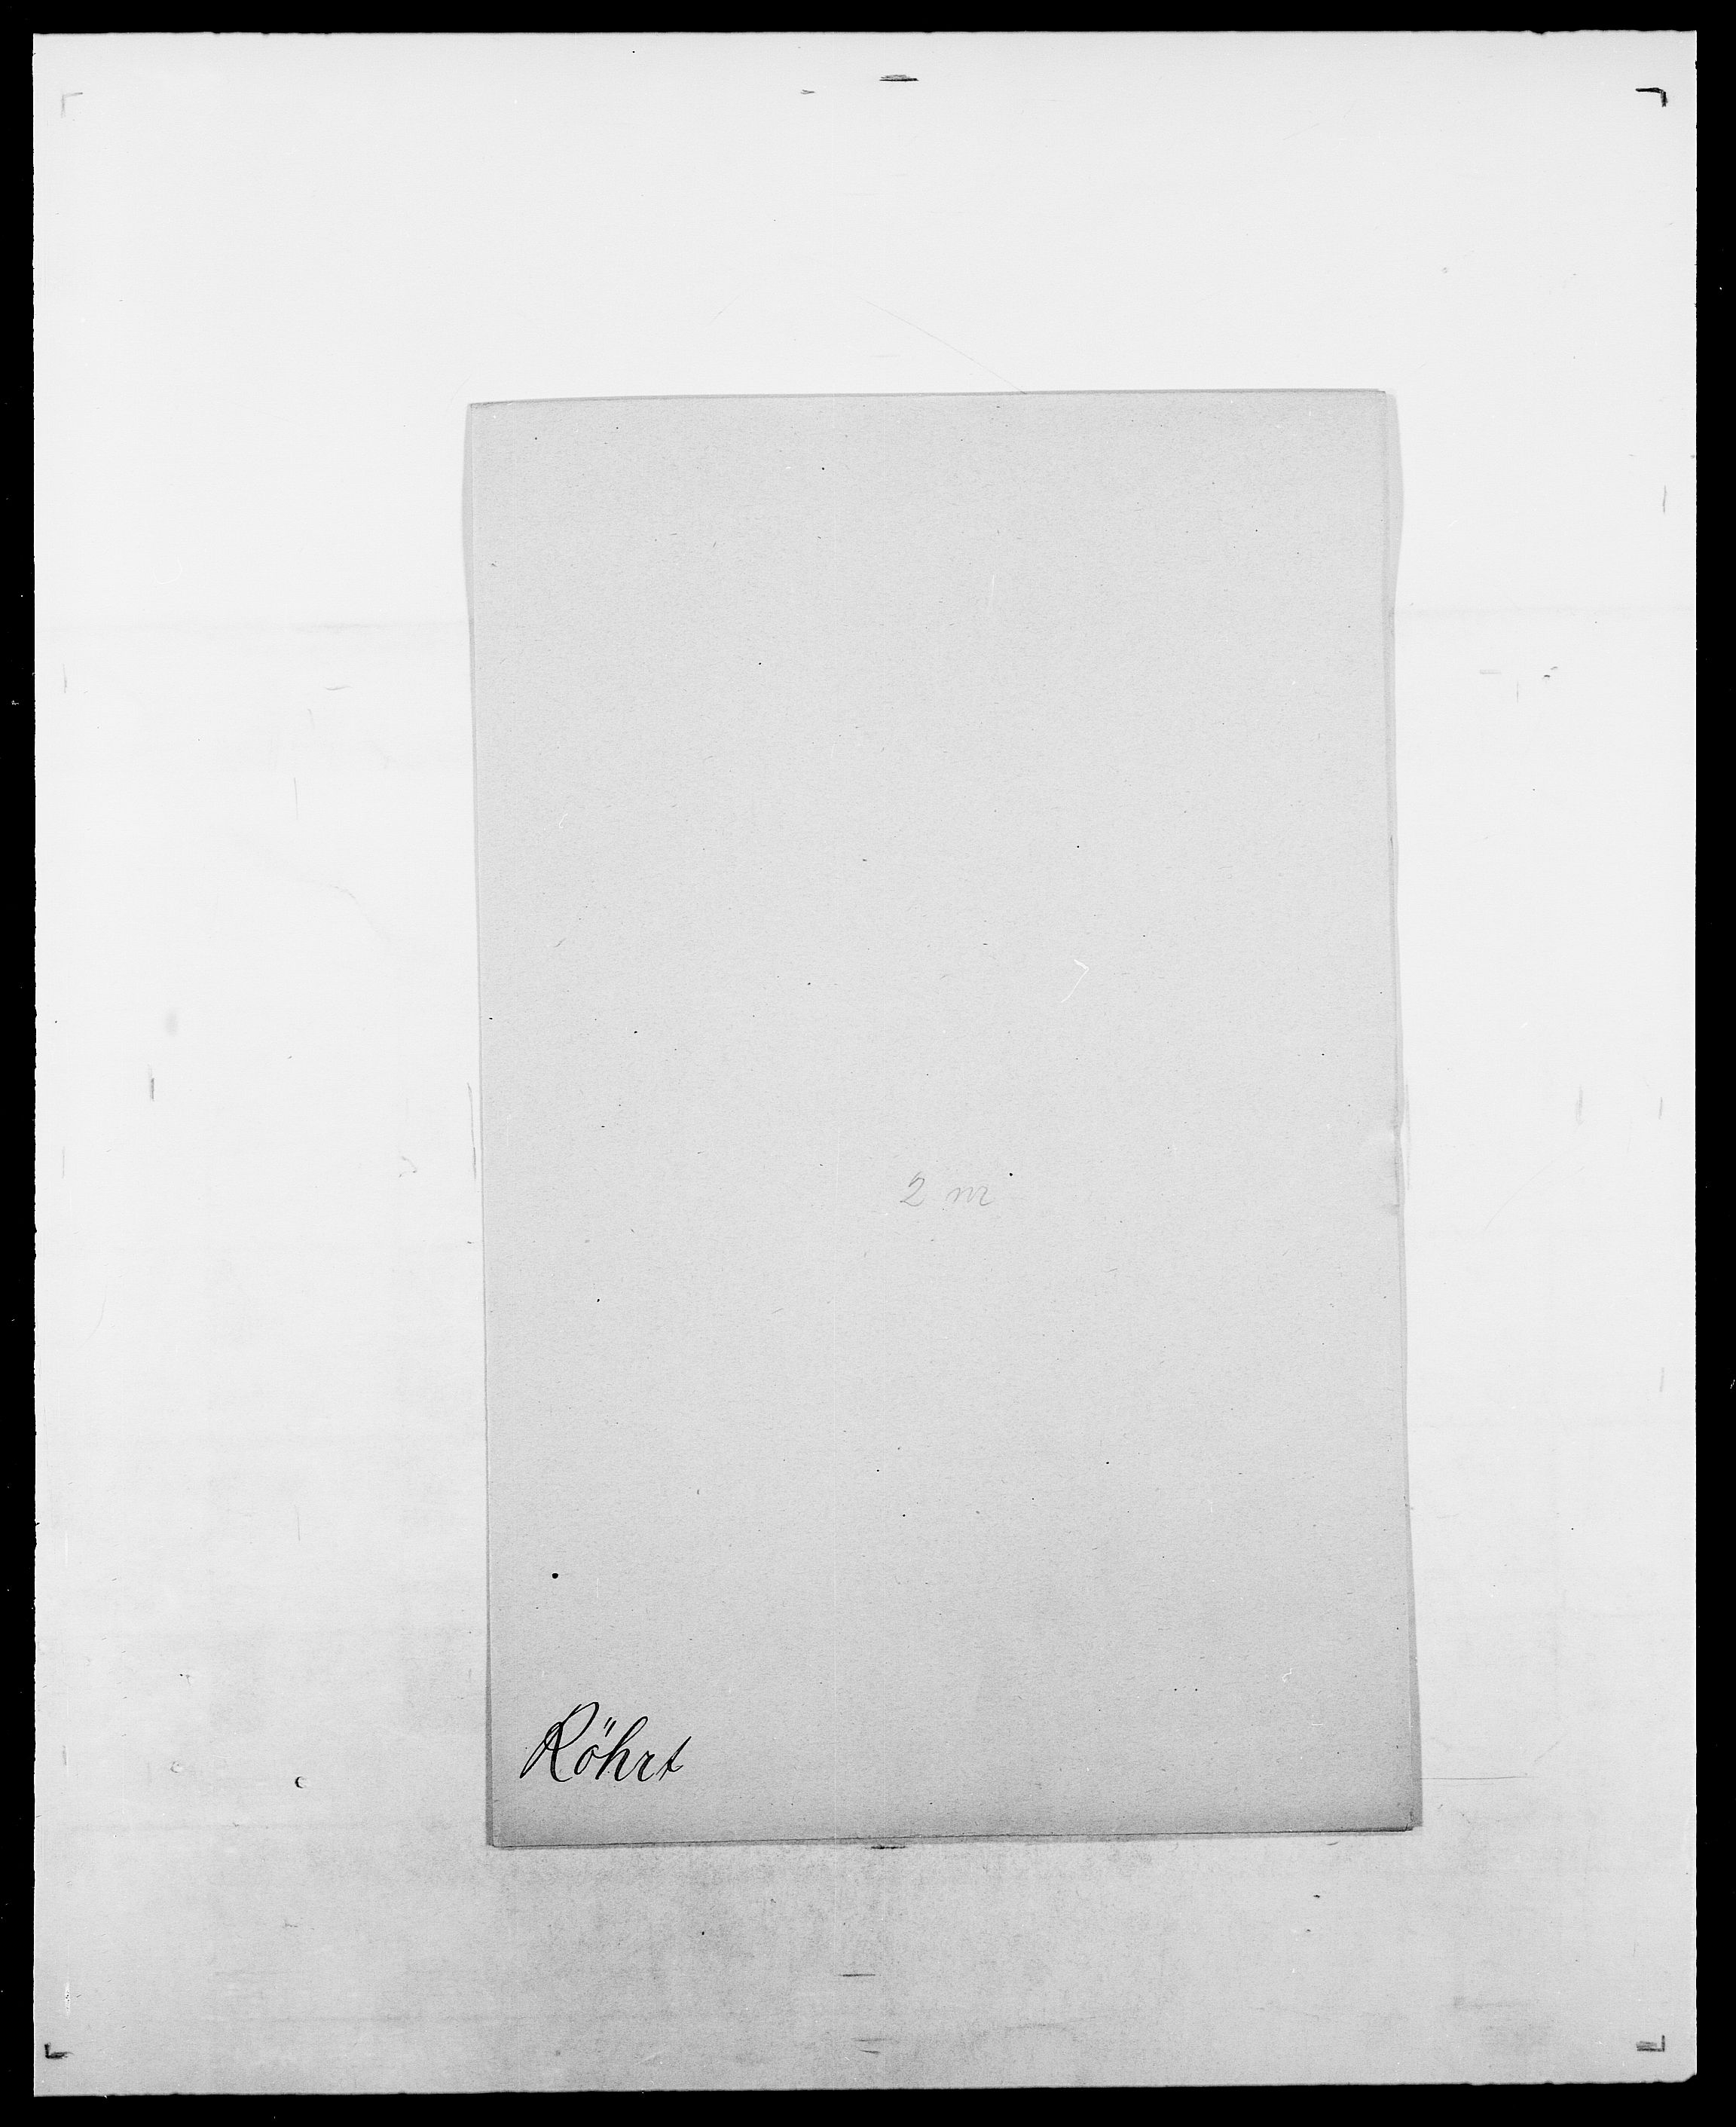 SAO, Delgobe, Charles Antoine - samling, D/Da/L0033: Roald - Røyem, s. 706